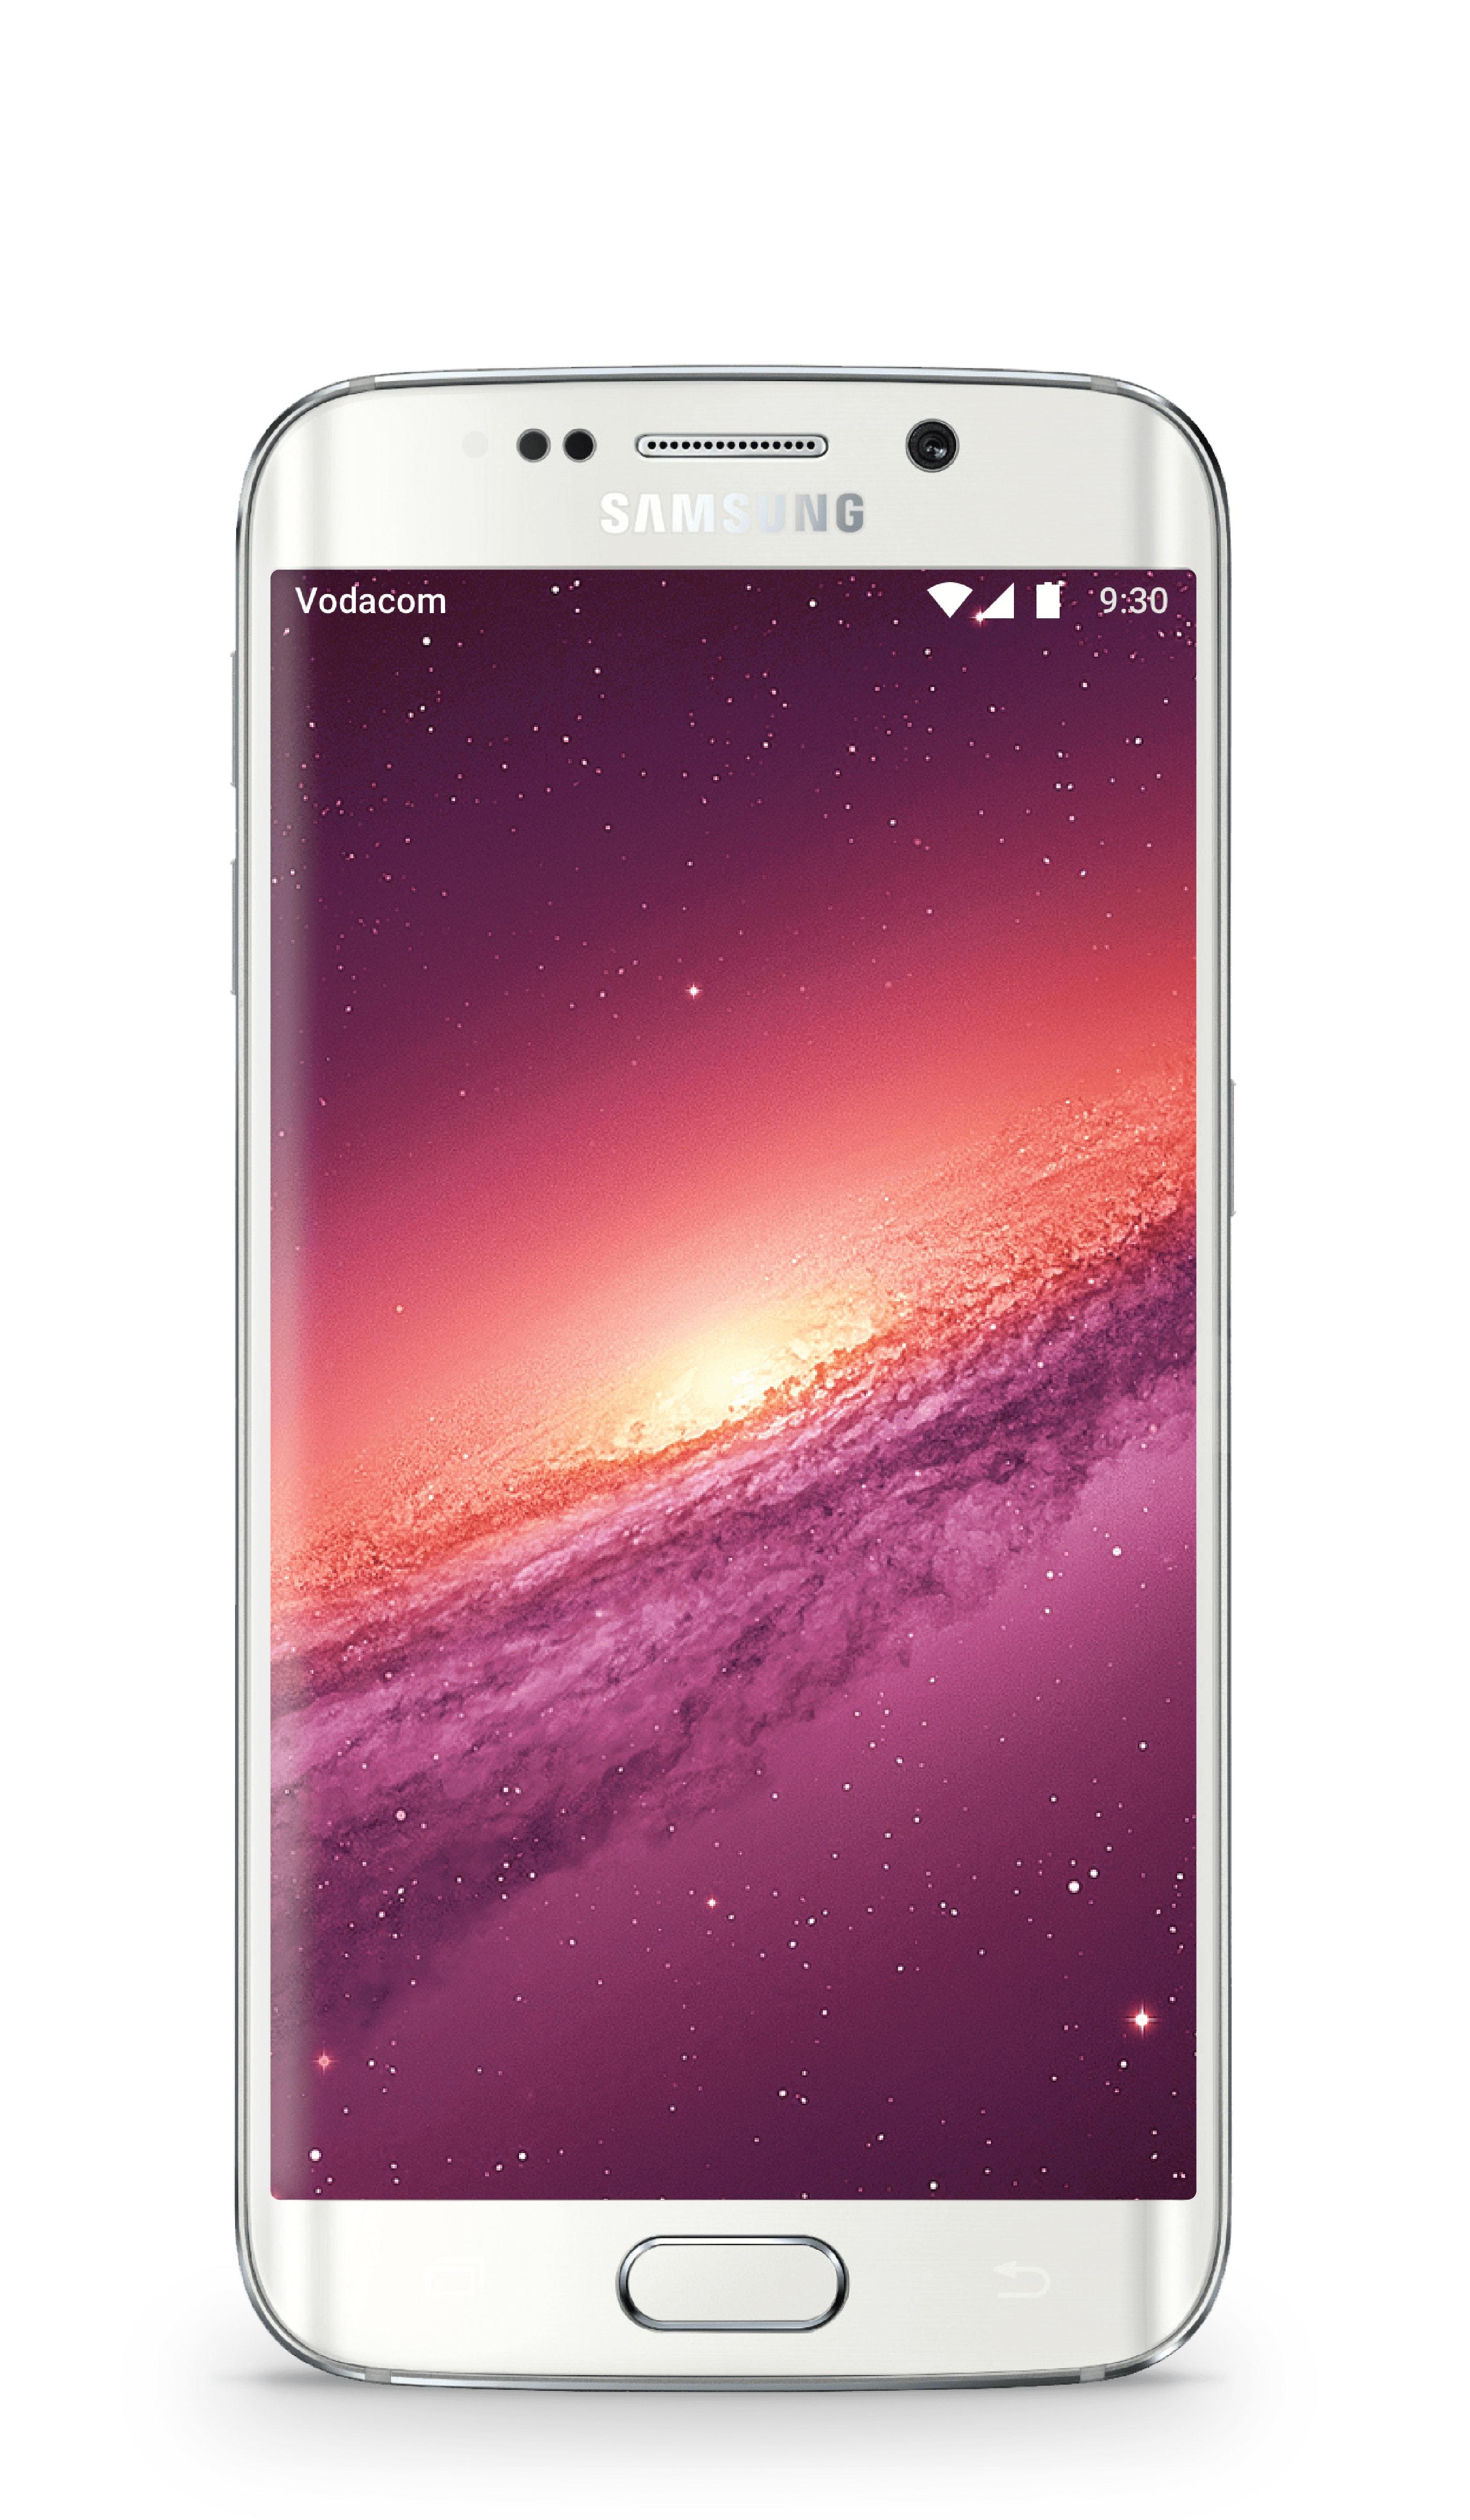 Samsung Galaxy S6 Edge image